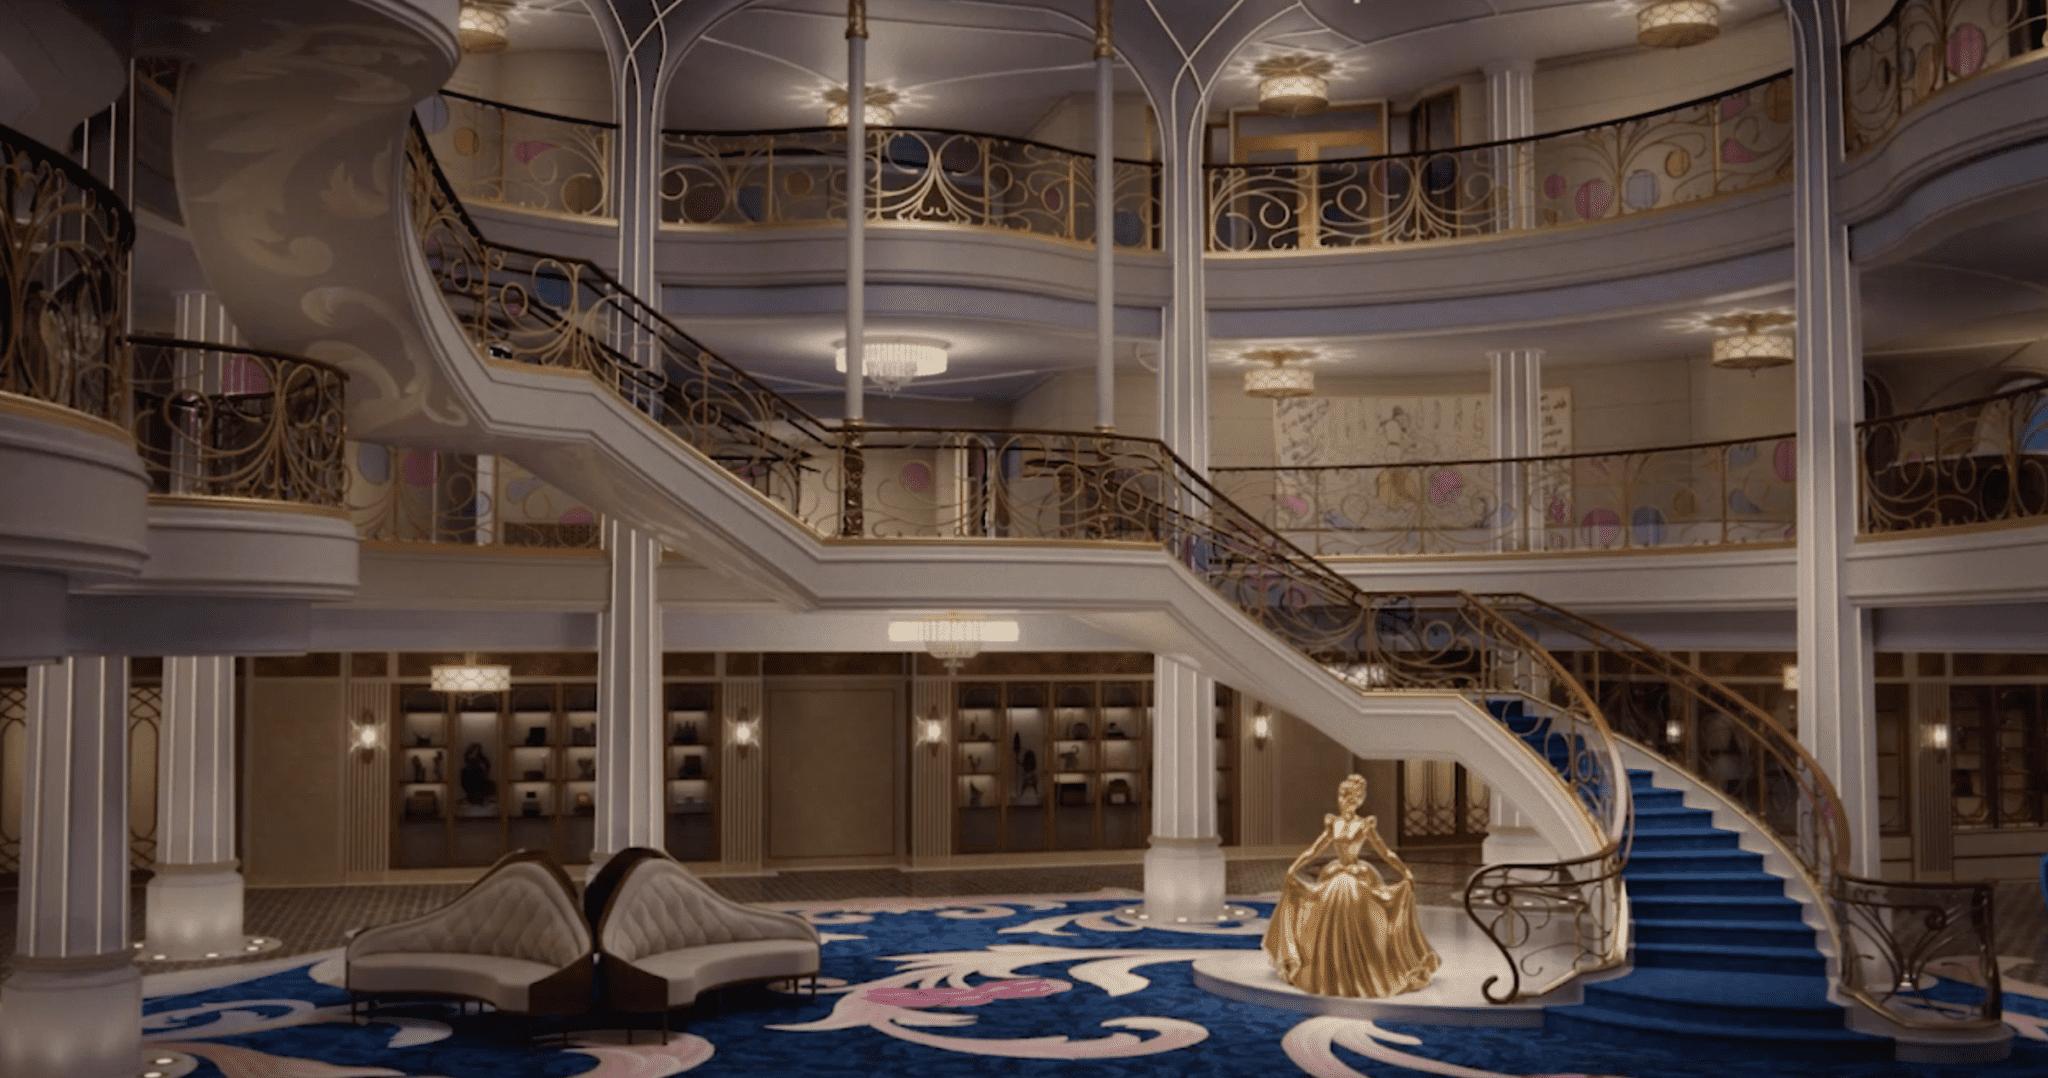 disney wish rendering grand hall atrium cinderella